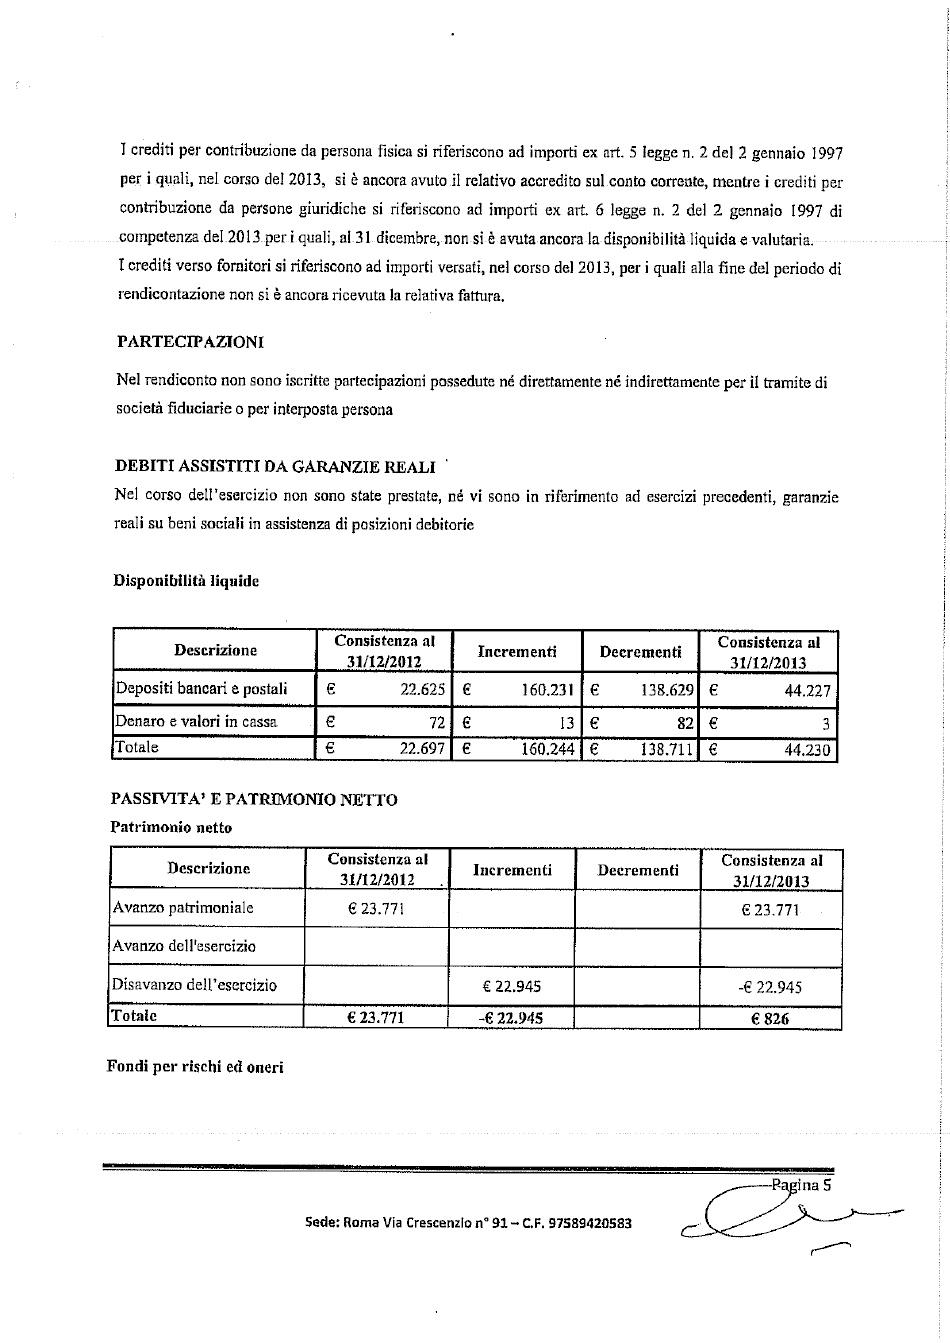 nota integrativa bilancio 2013-5